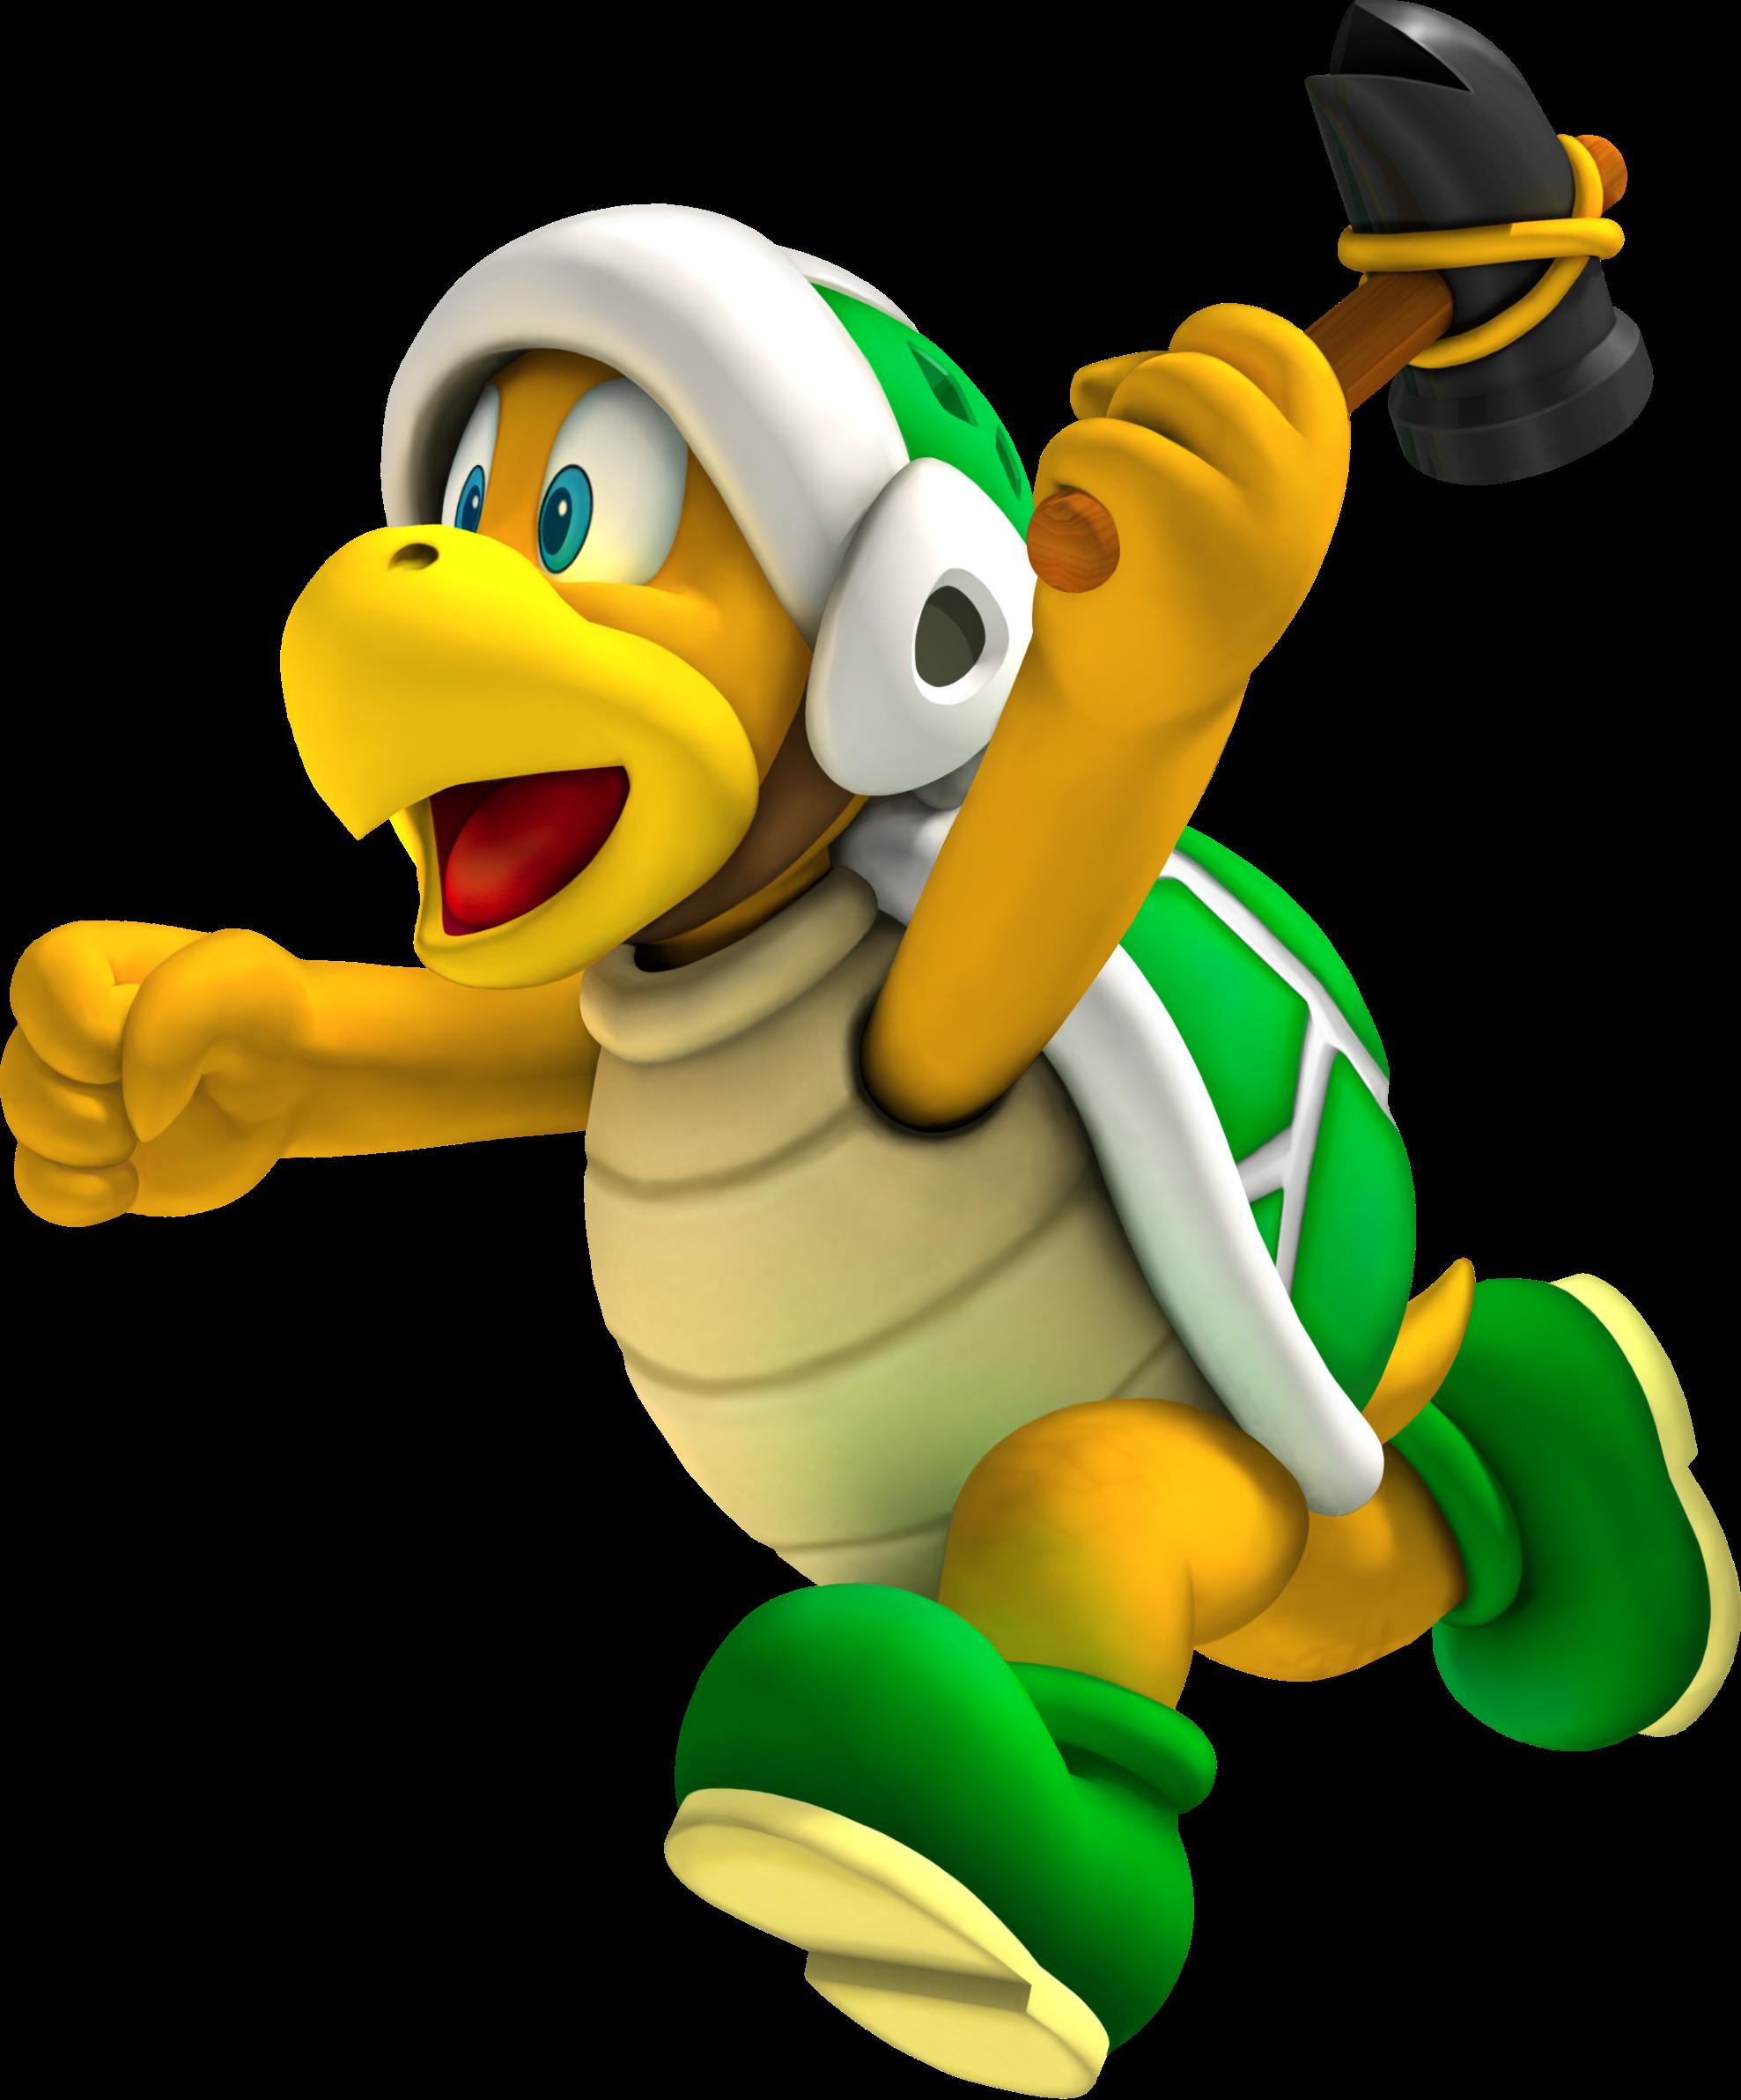 Hammer Bro Mario Kart Racing Wiki Fandom Powered By Wikia